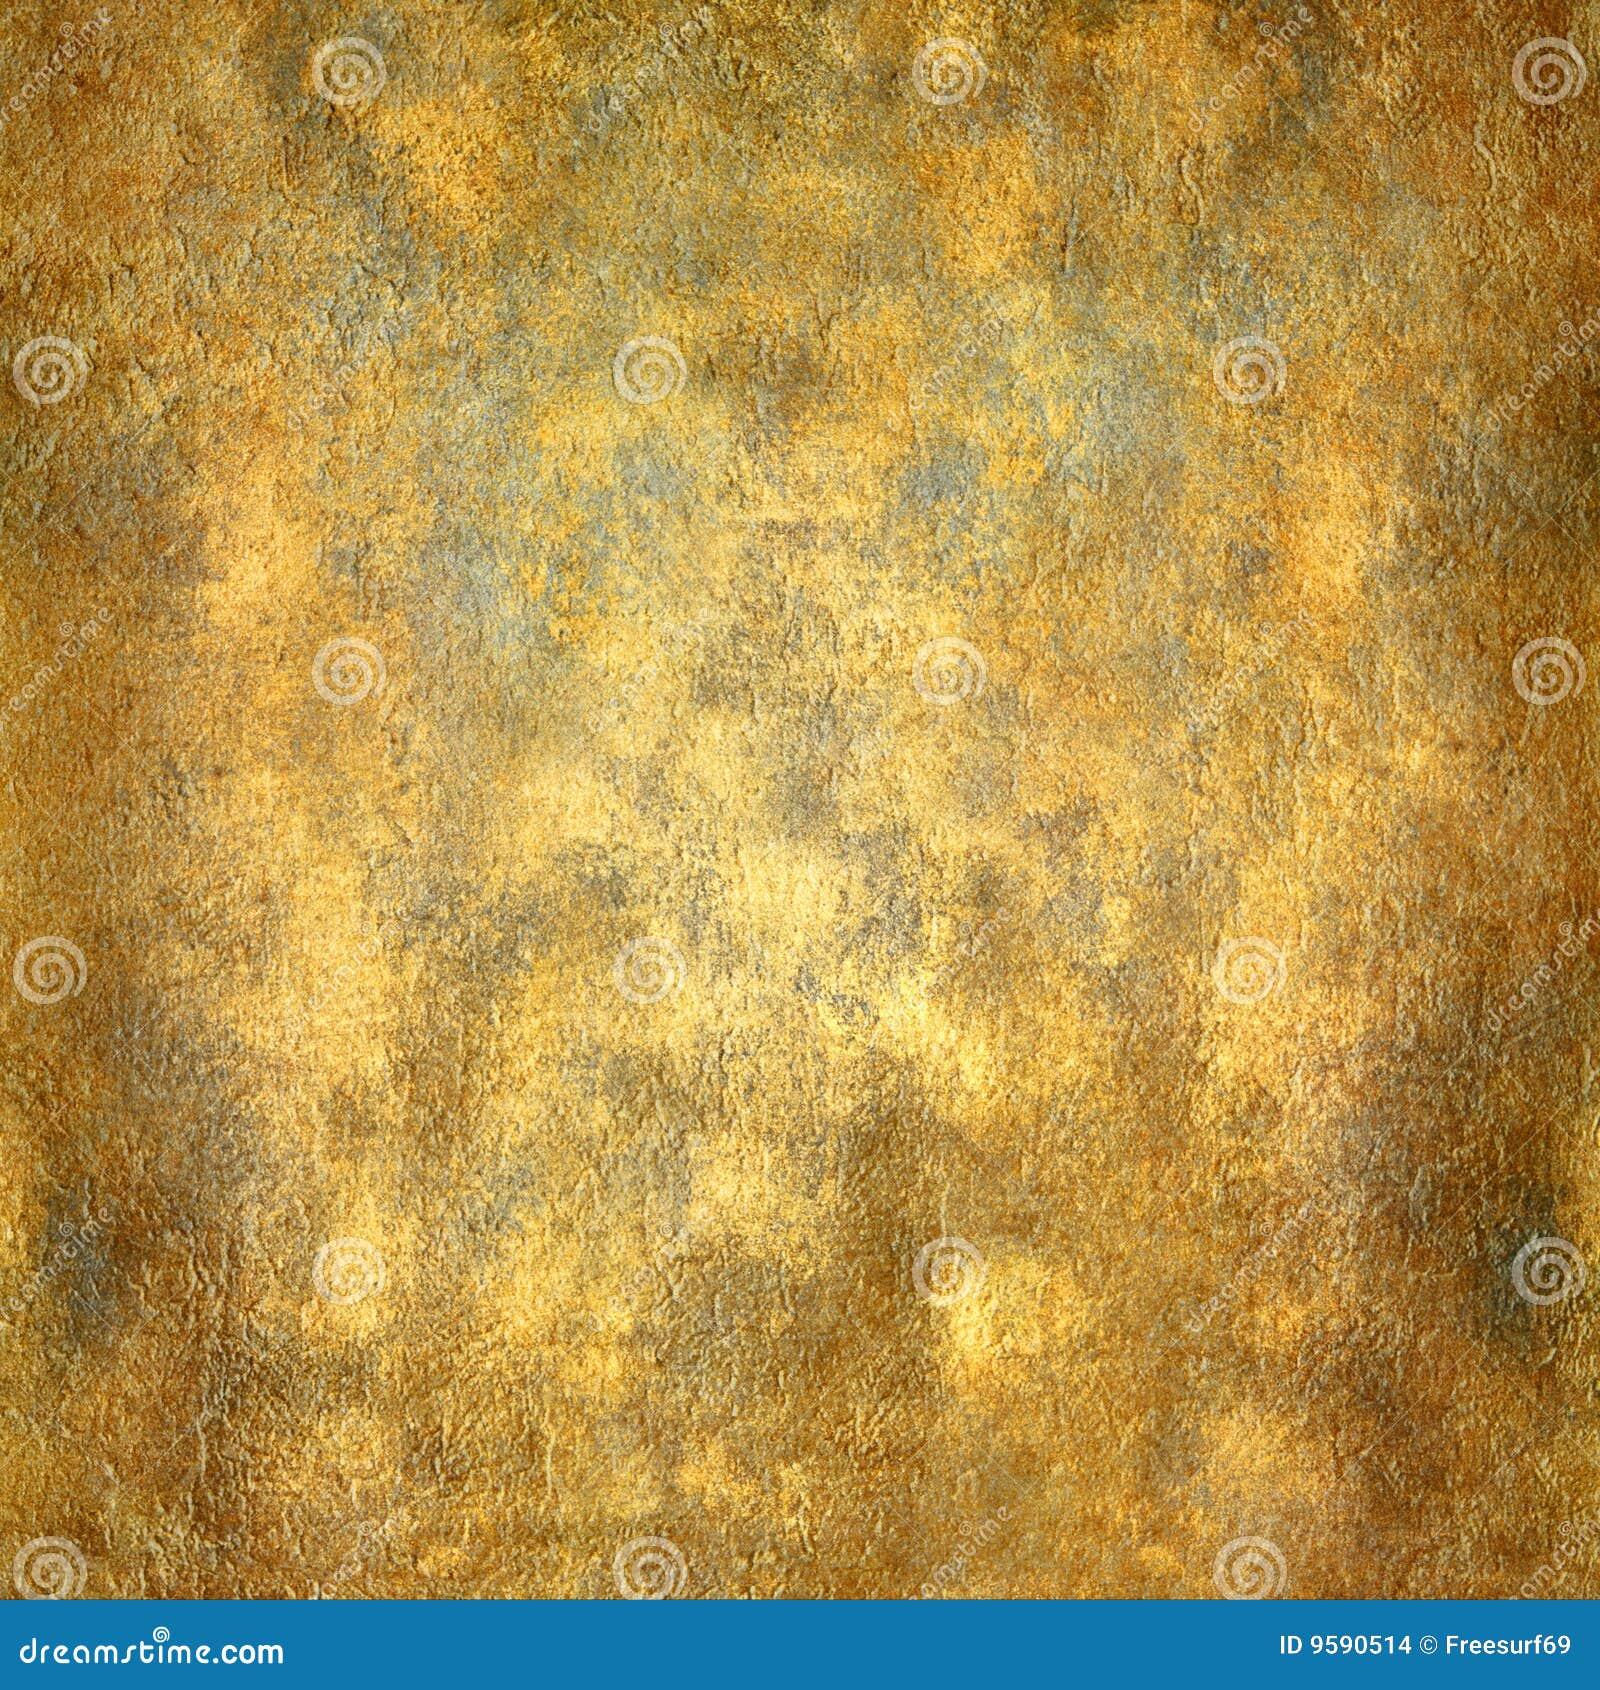 Golden stucco